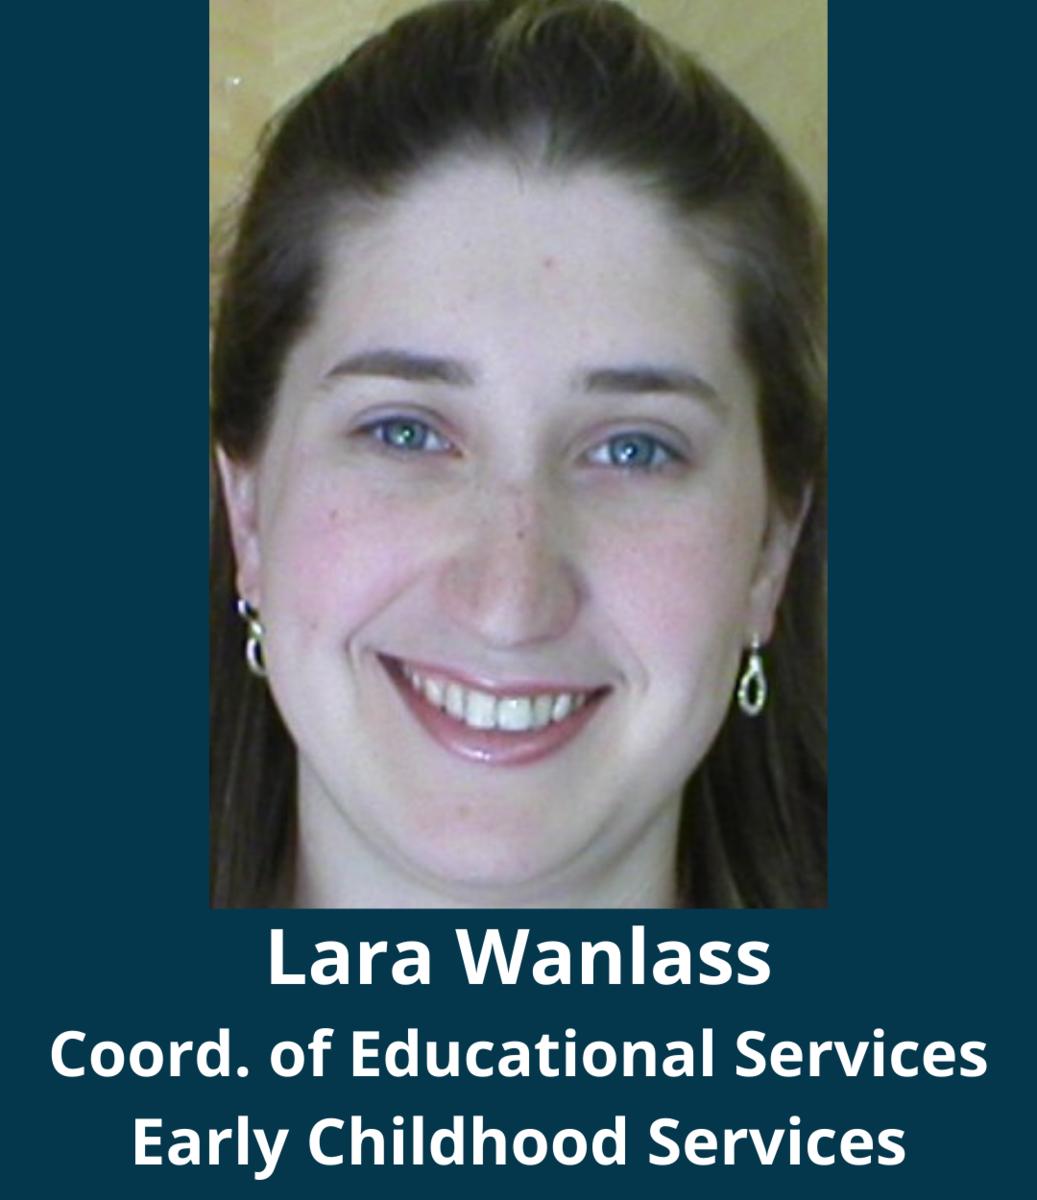 Lara Wanlass